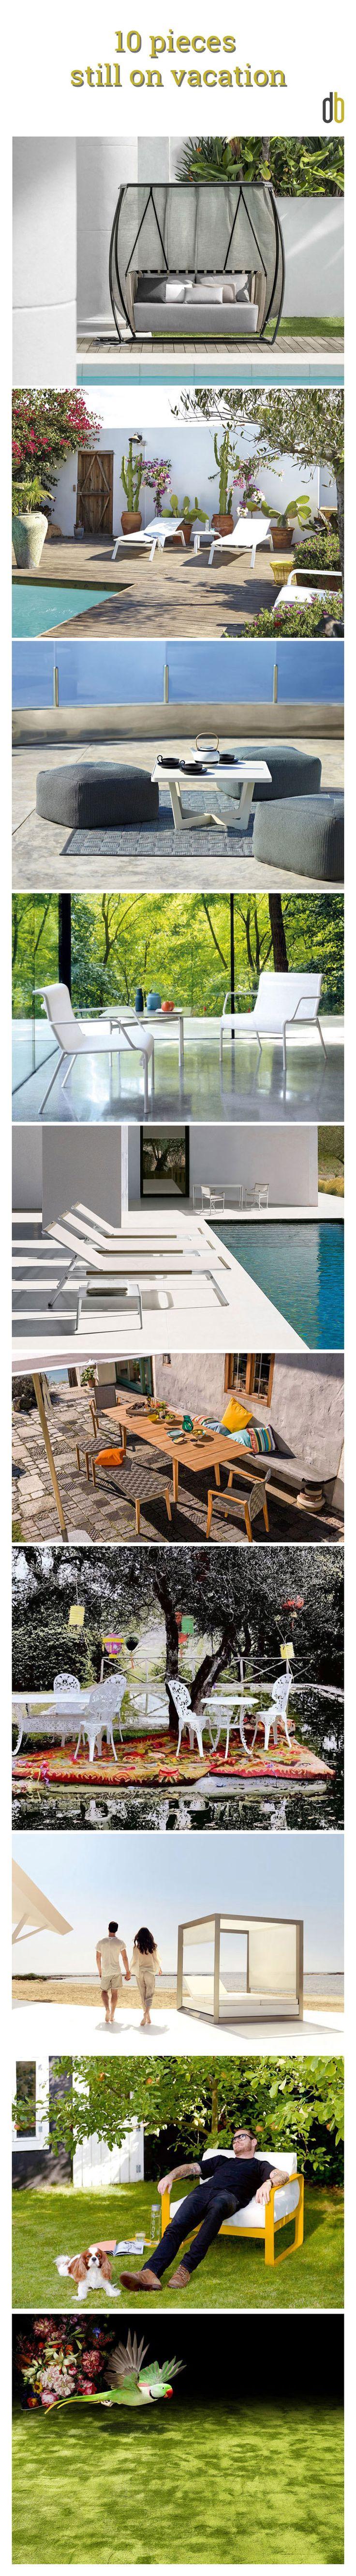 Design Culture | Top 10 | Ten pieces still on vacation ... for those who are still thinking about this summer! | @patricknorguet - @ethimofr - @objectcarpet -@borjagarcia - @bebitalia - @vondom - @fermob - @caneline | #designbest